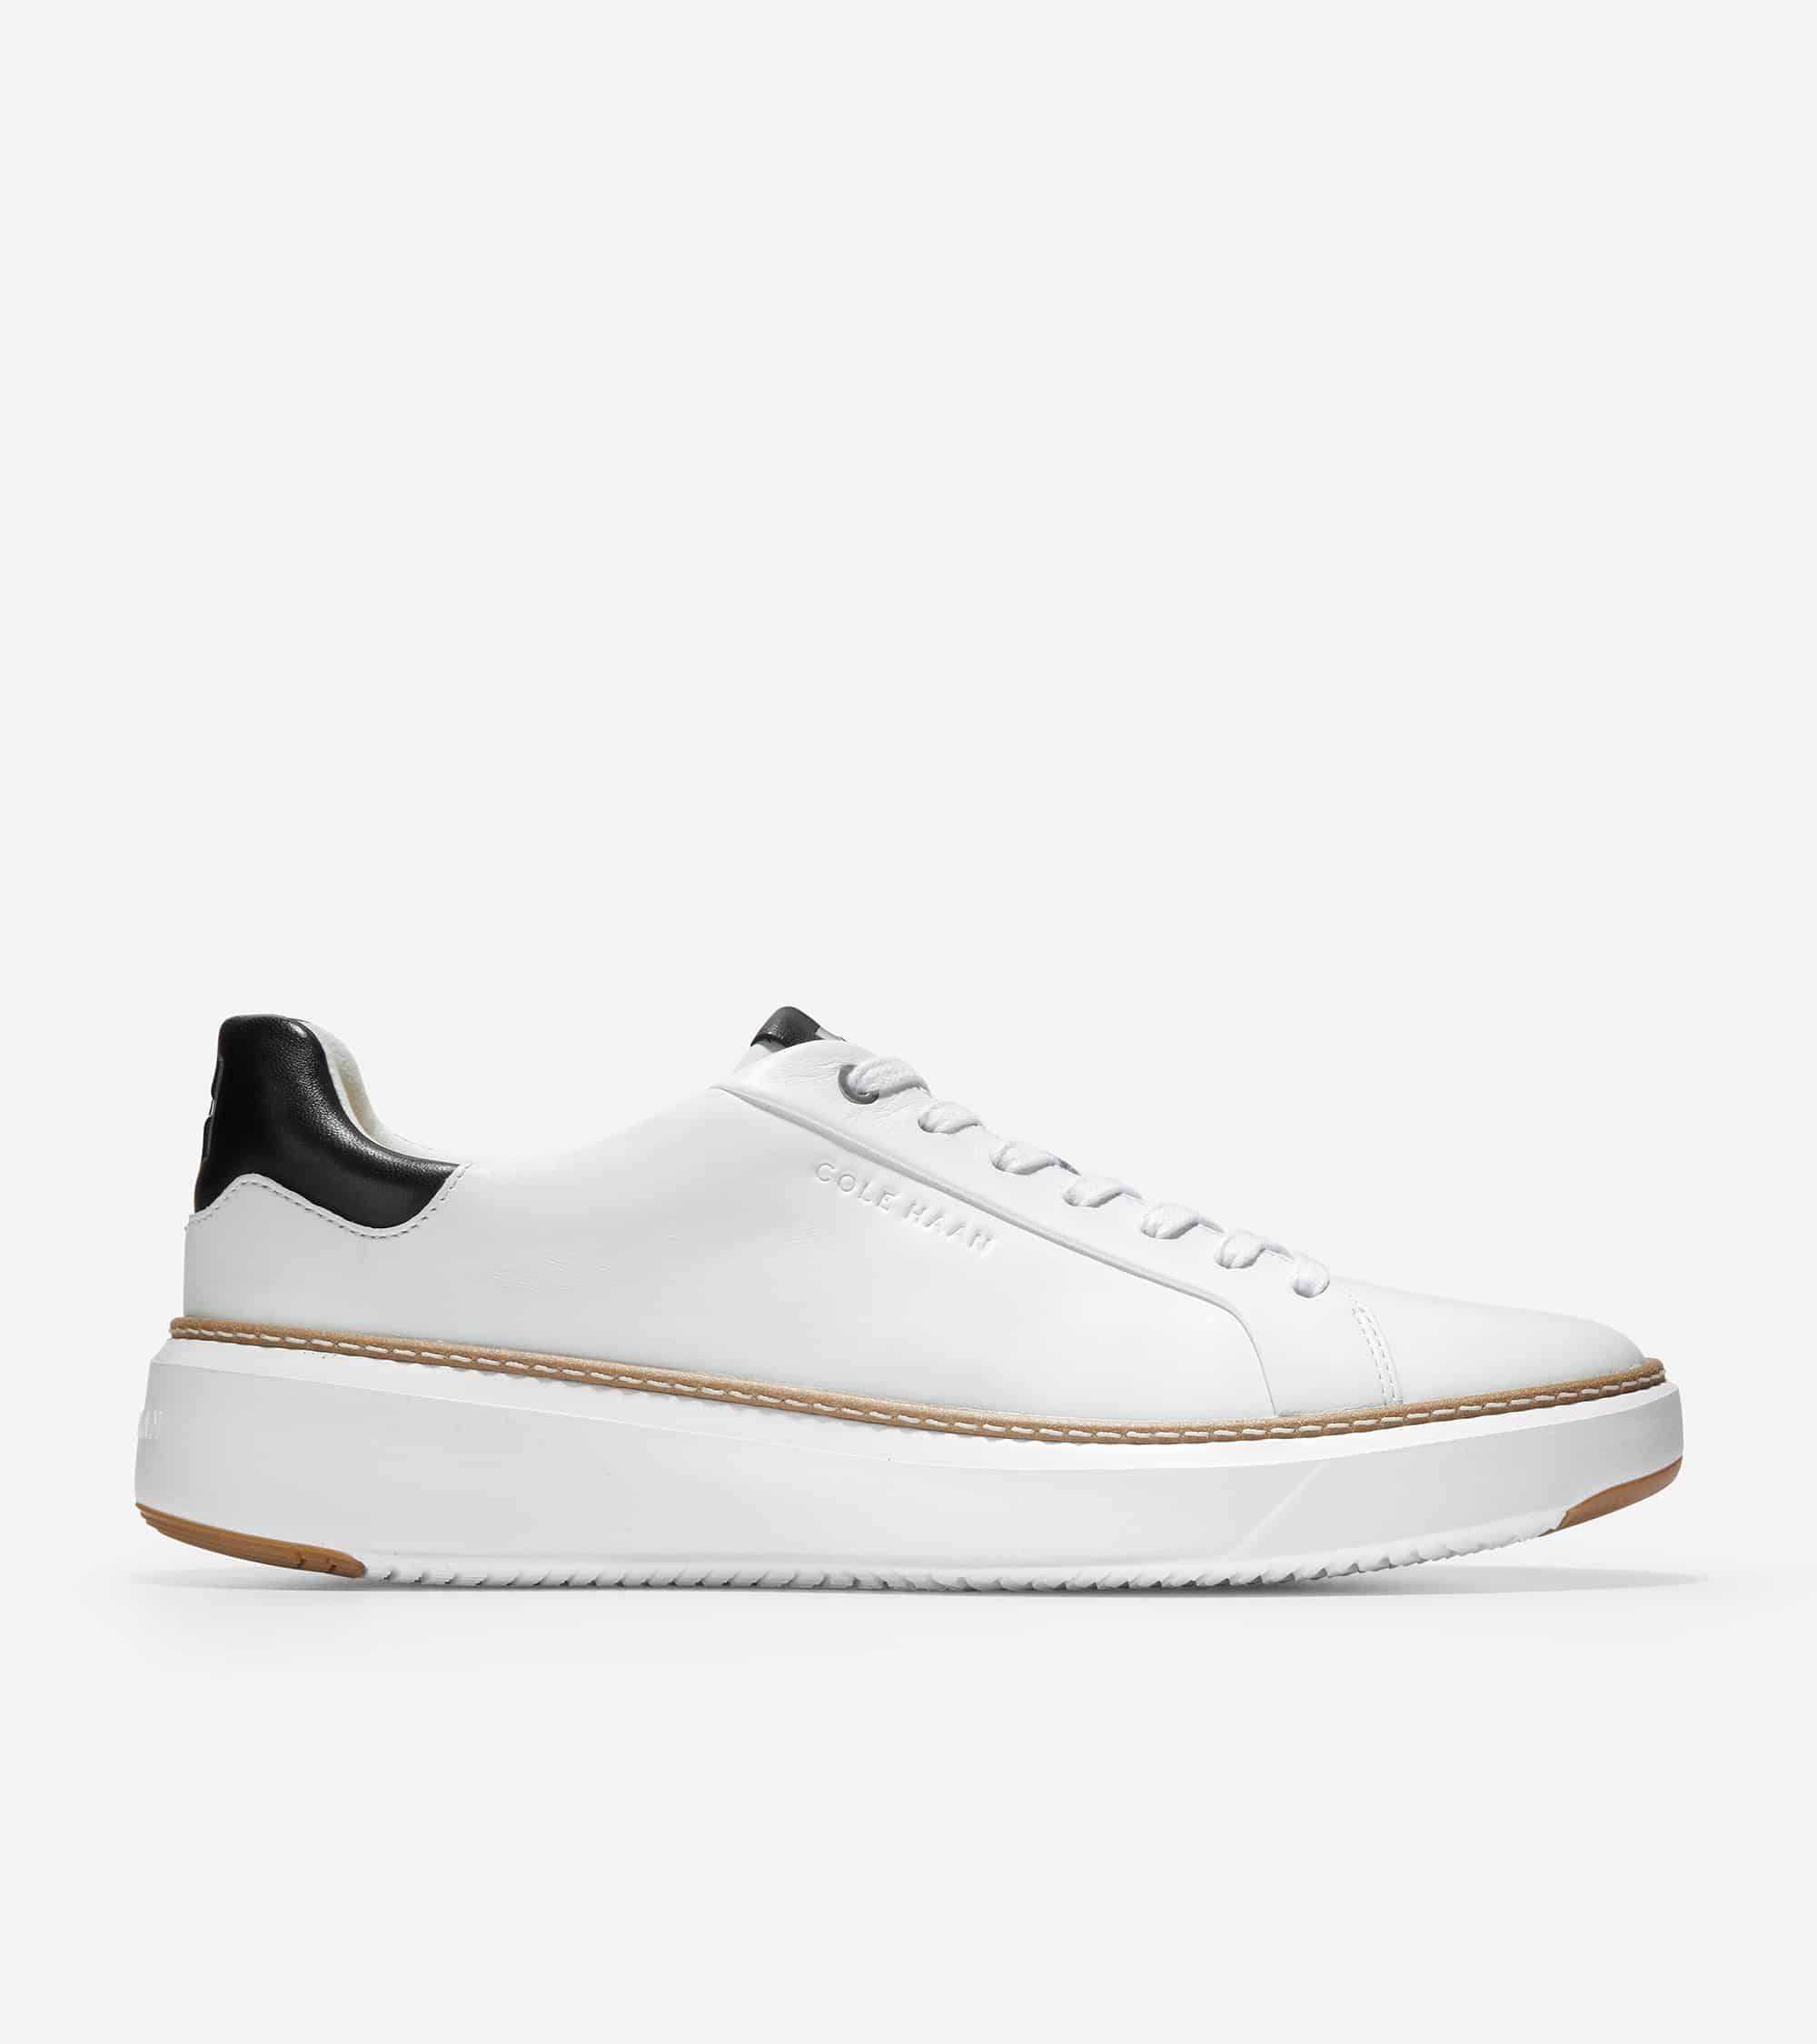 Cole Haan GrandPrø Topspin Sneaker Optic White